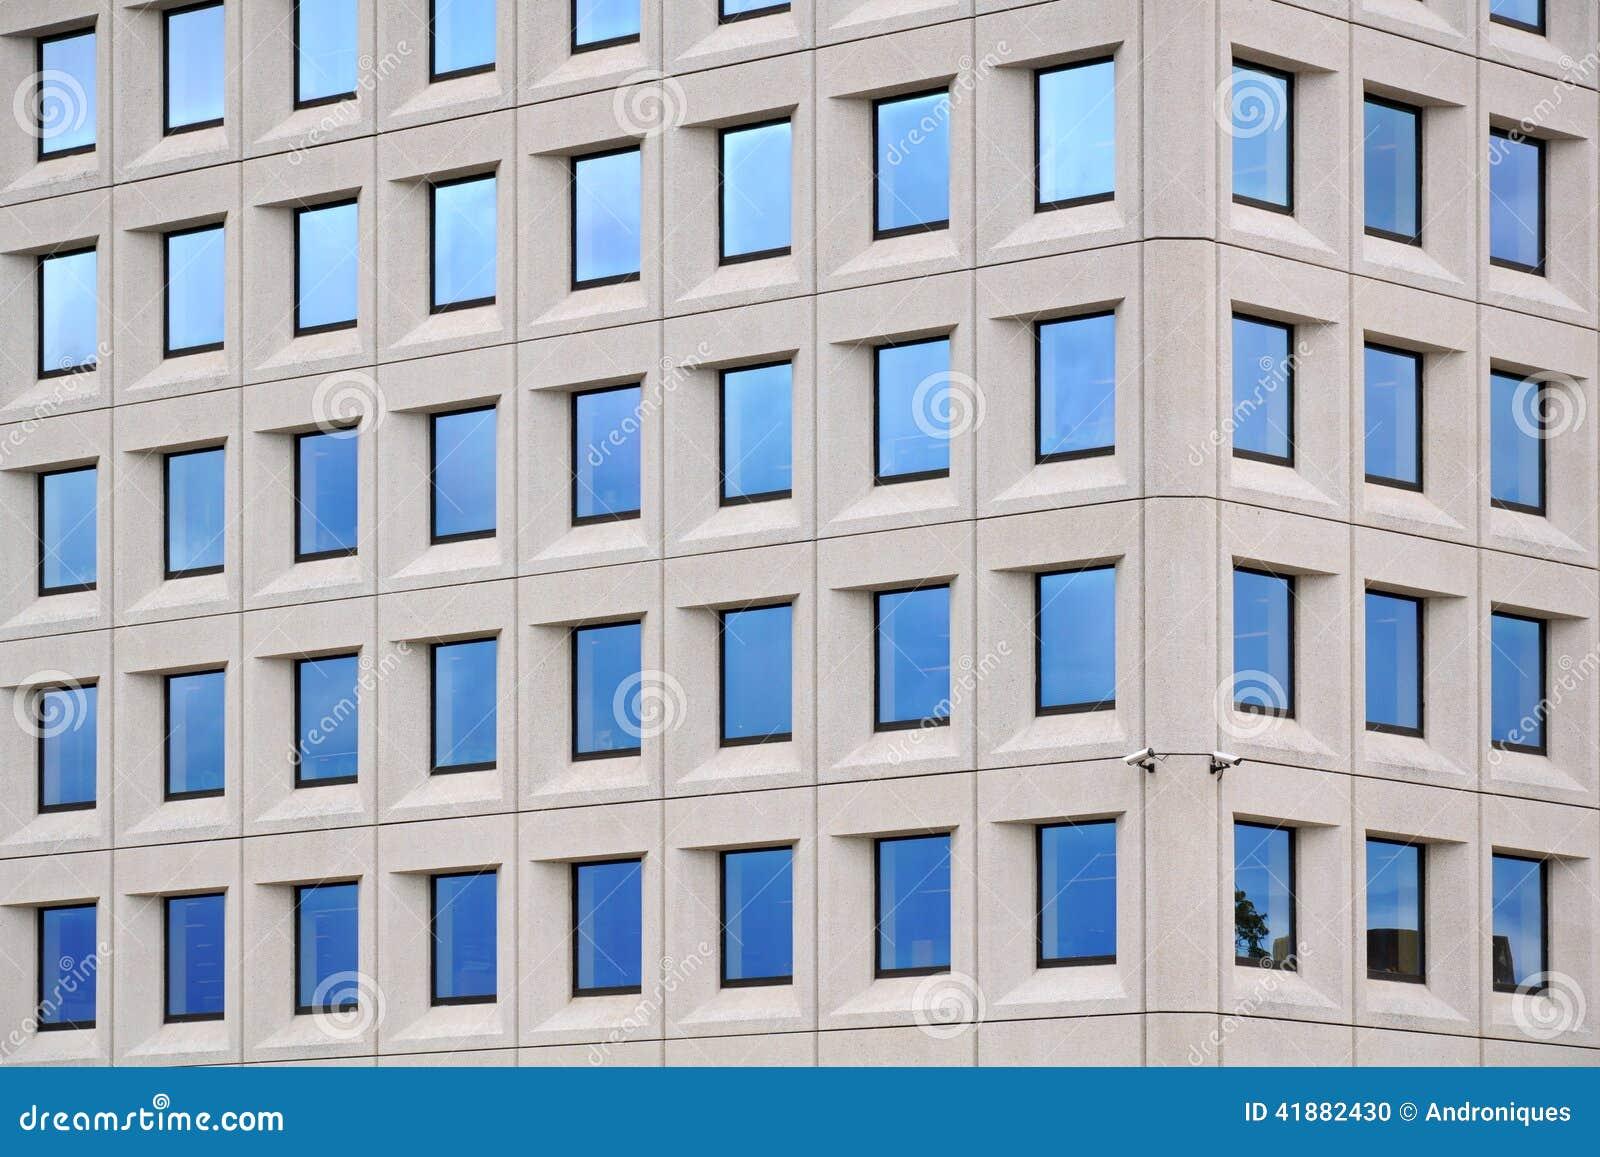 Concrete Building With Windows : Modern concrete building with blue sky windows stock photo